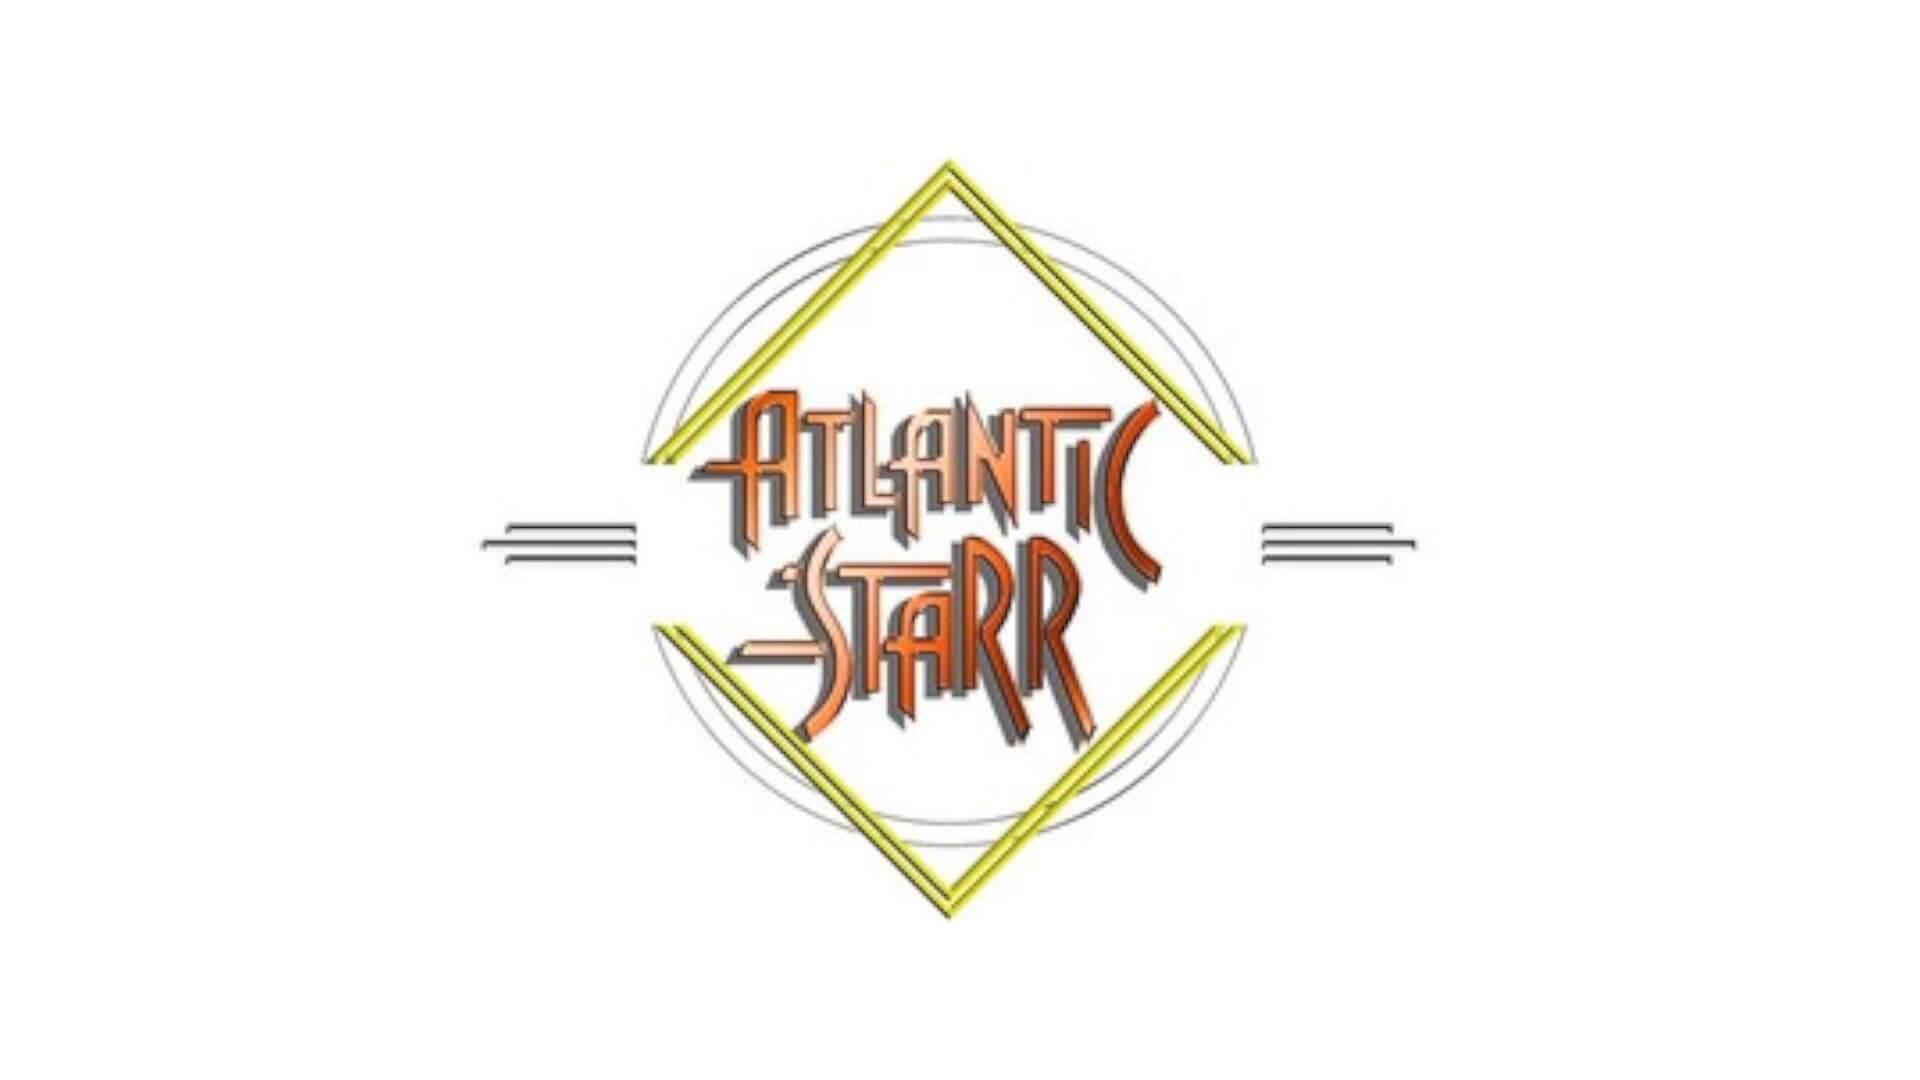 Top 5 Tracks From Atlantic Starr